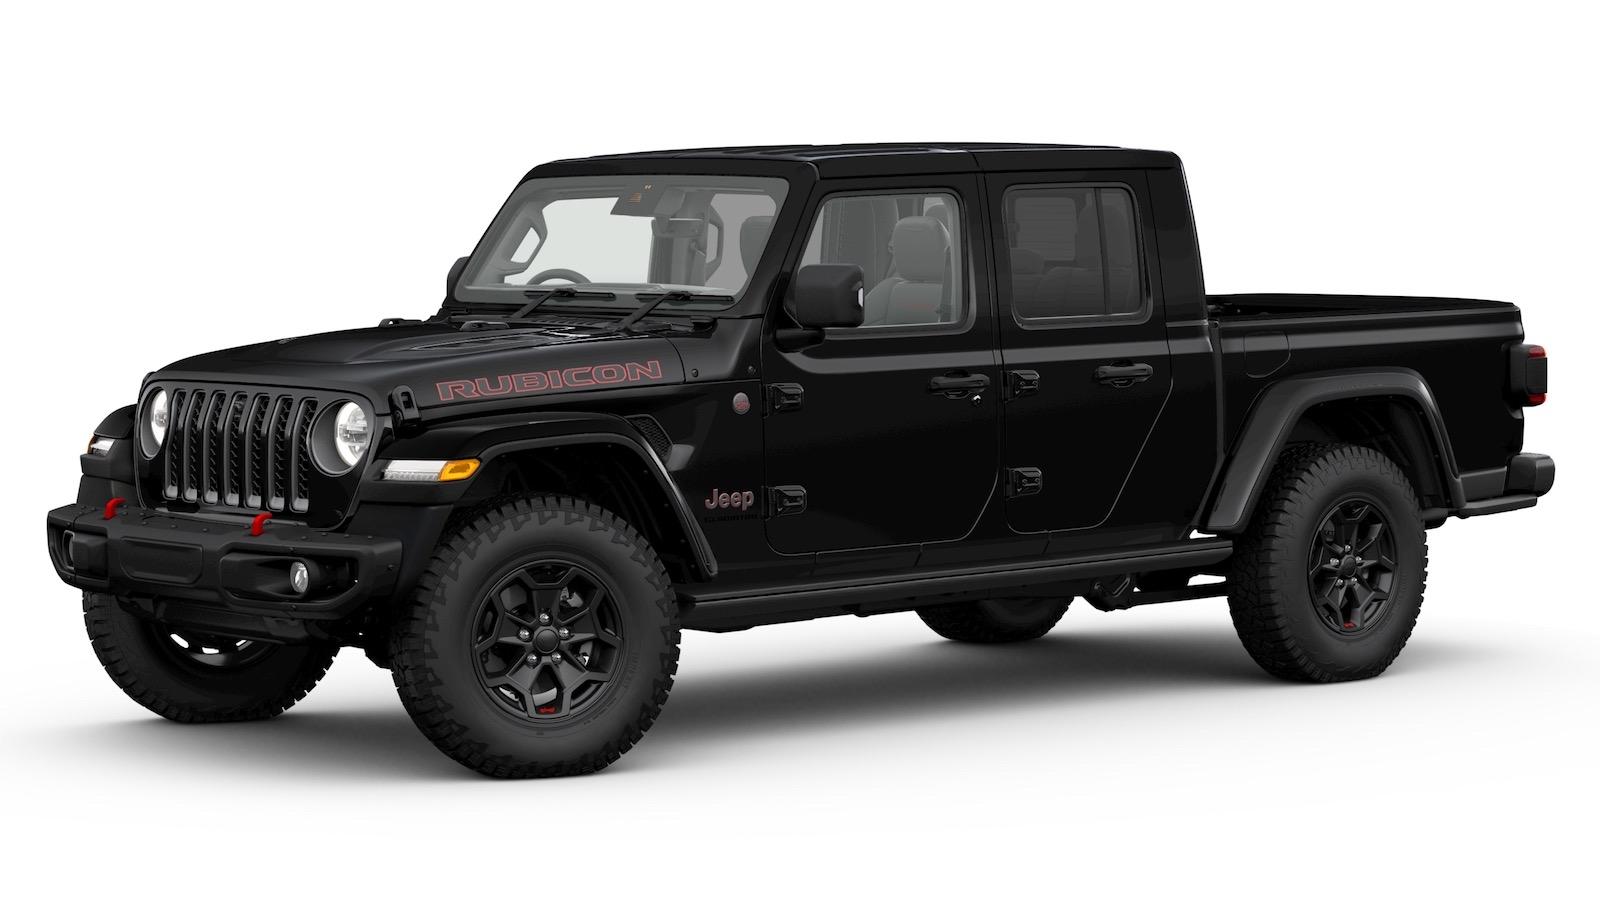 2020 Jeep Gladiator ute now on sale in Australia, arrives ...